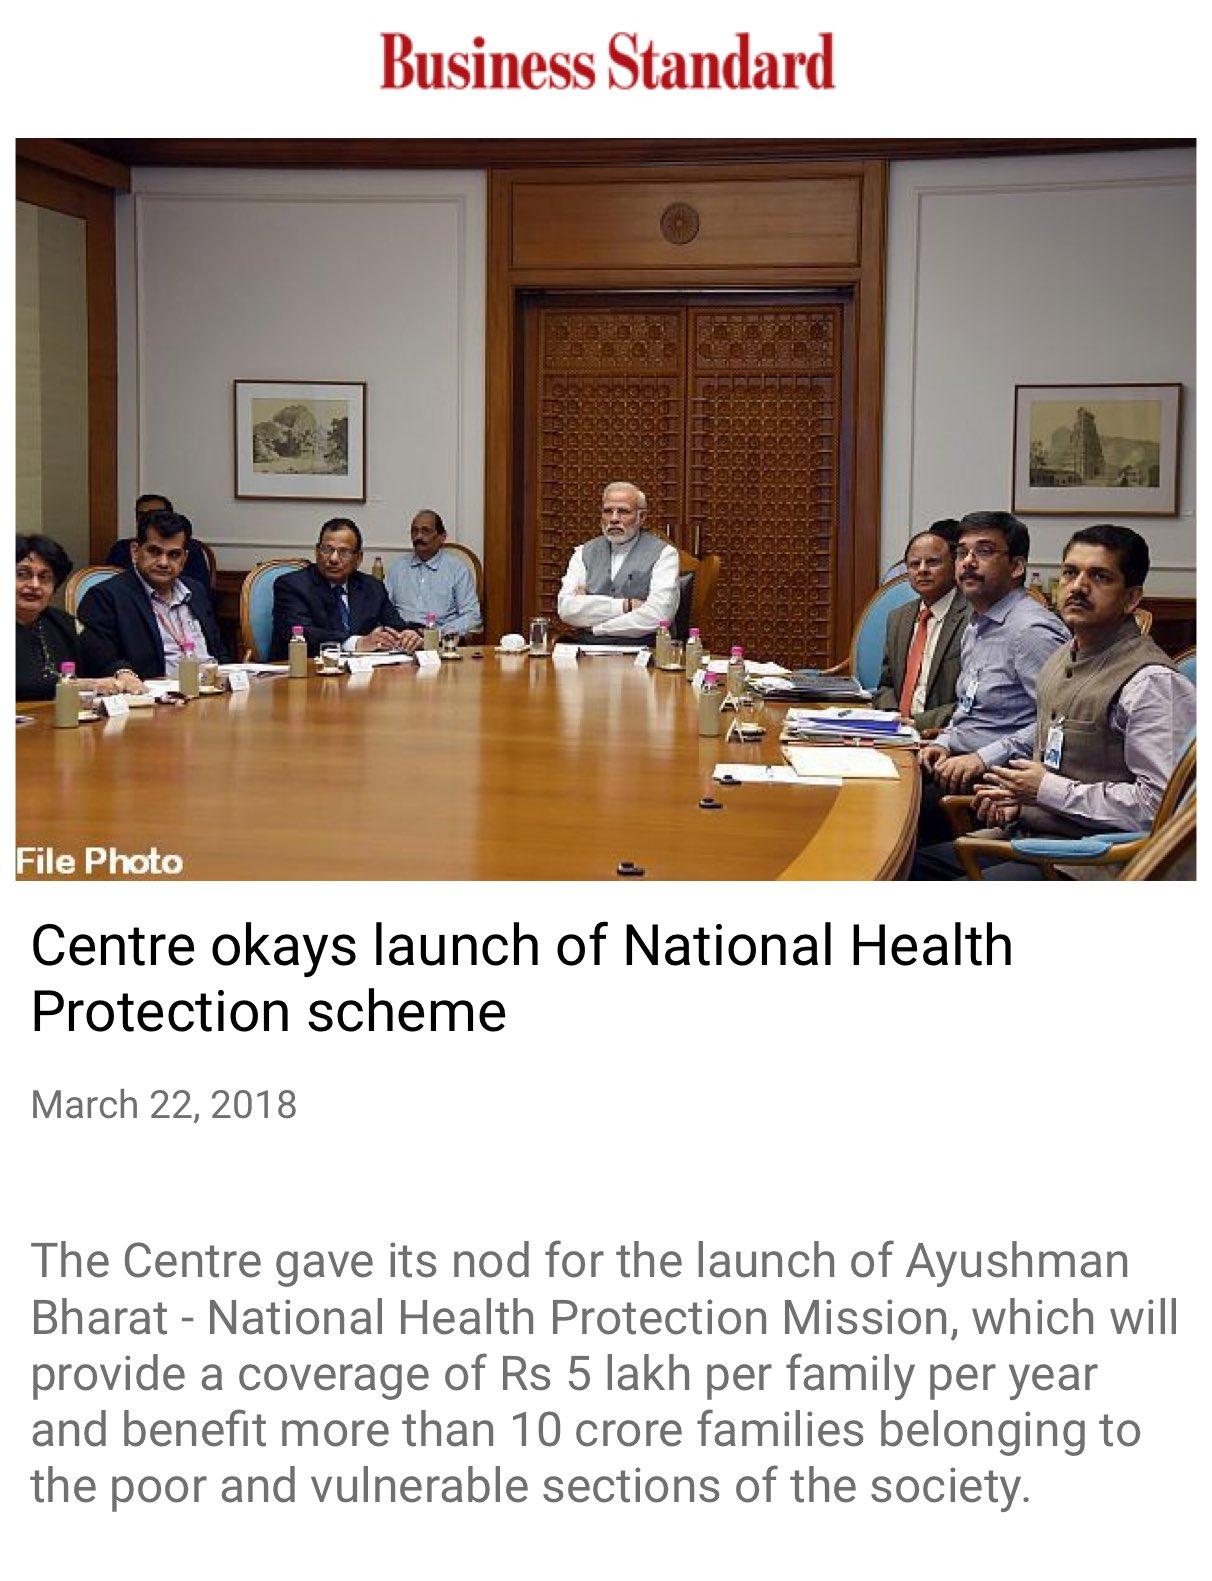 Centre okays launch of National Health Protection scheme.  https://t.co/VlDoqFz106  via NMApp https://t.co/8nHp1D2Hw0